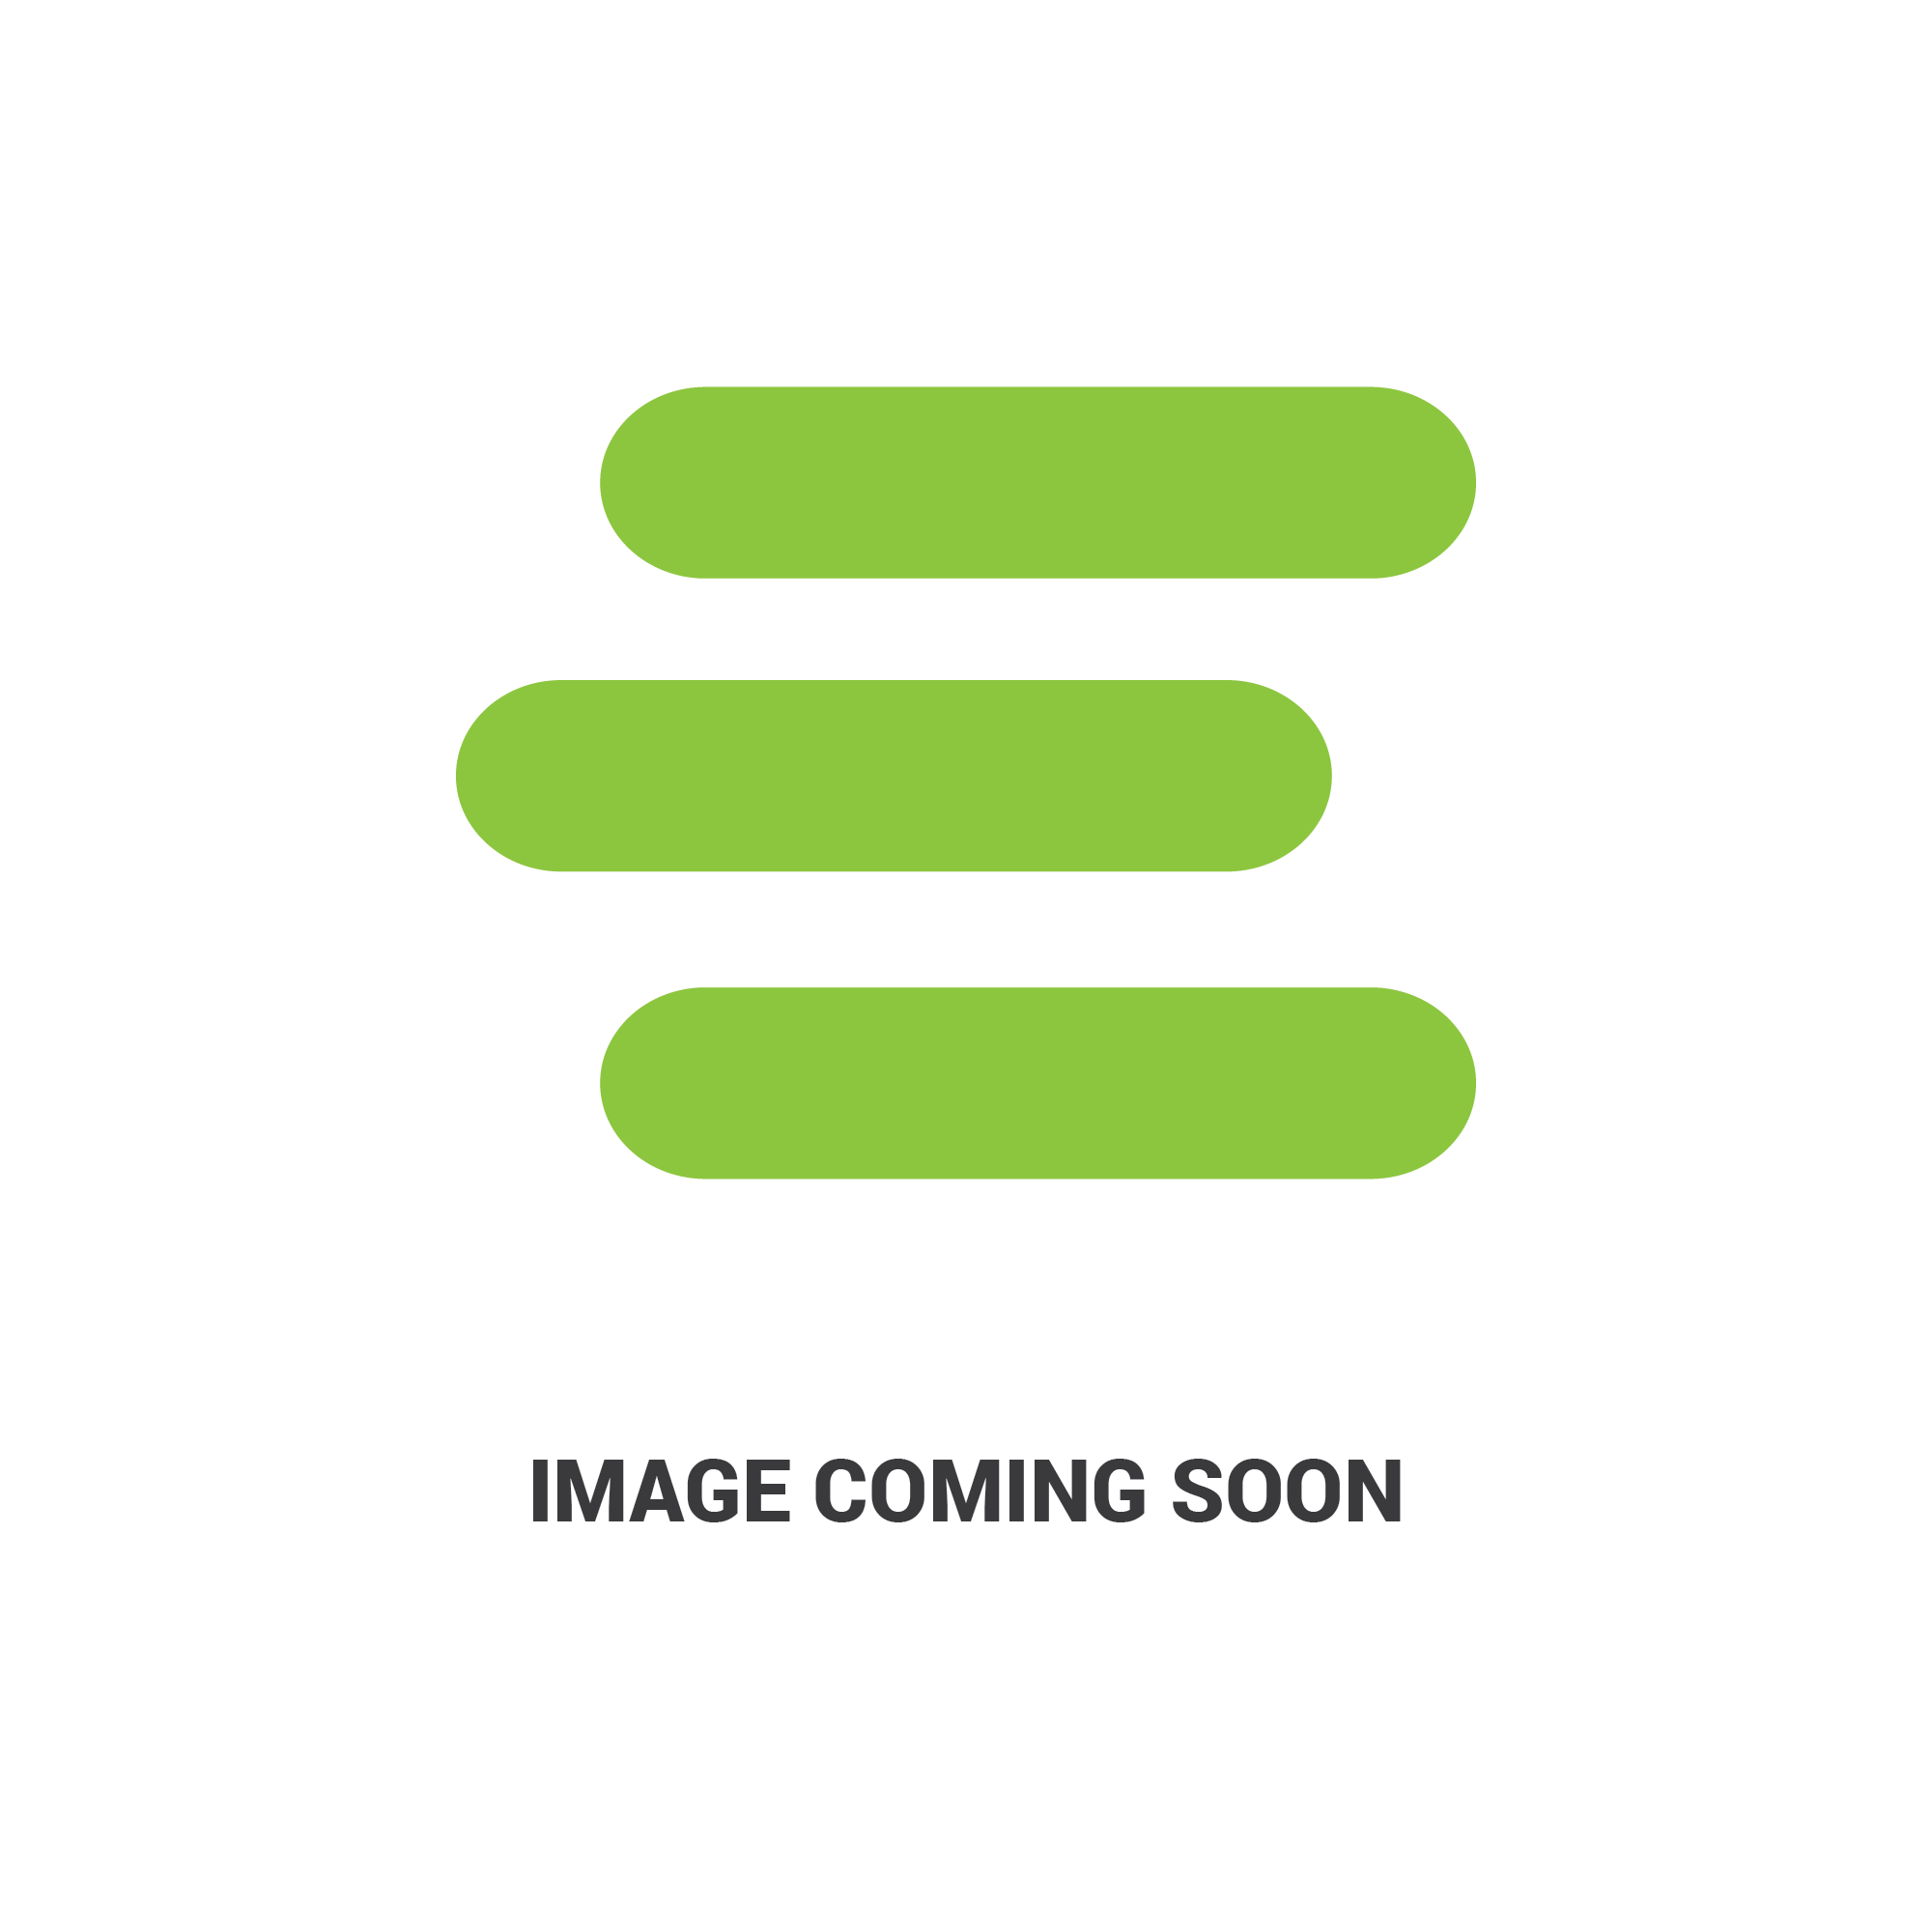 E-15221-12433edit 1.jpg